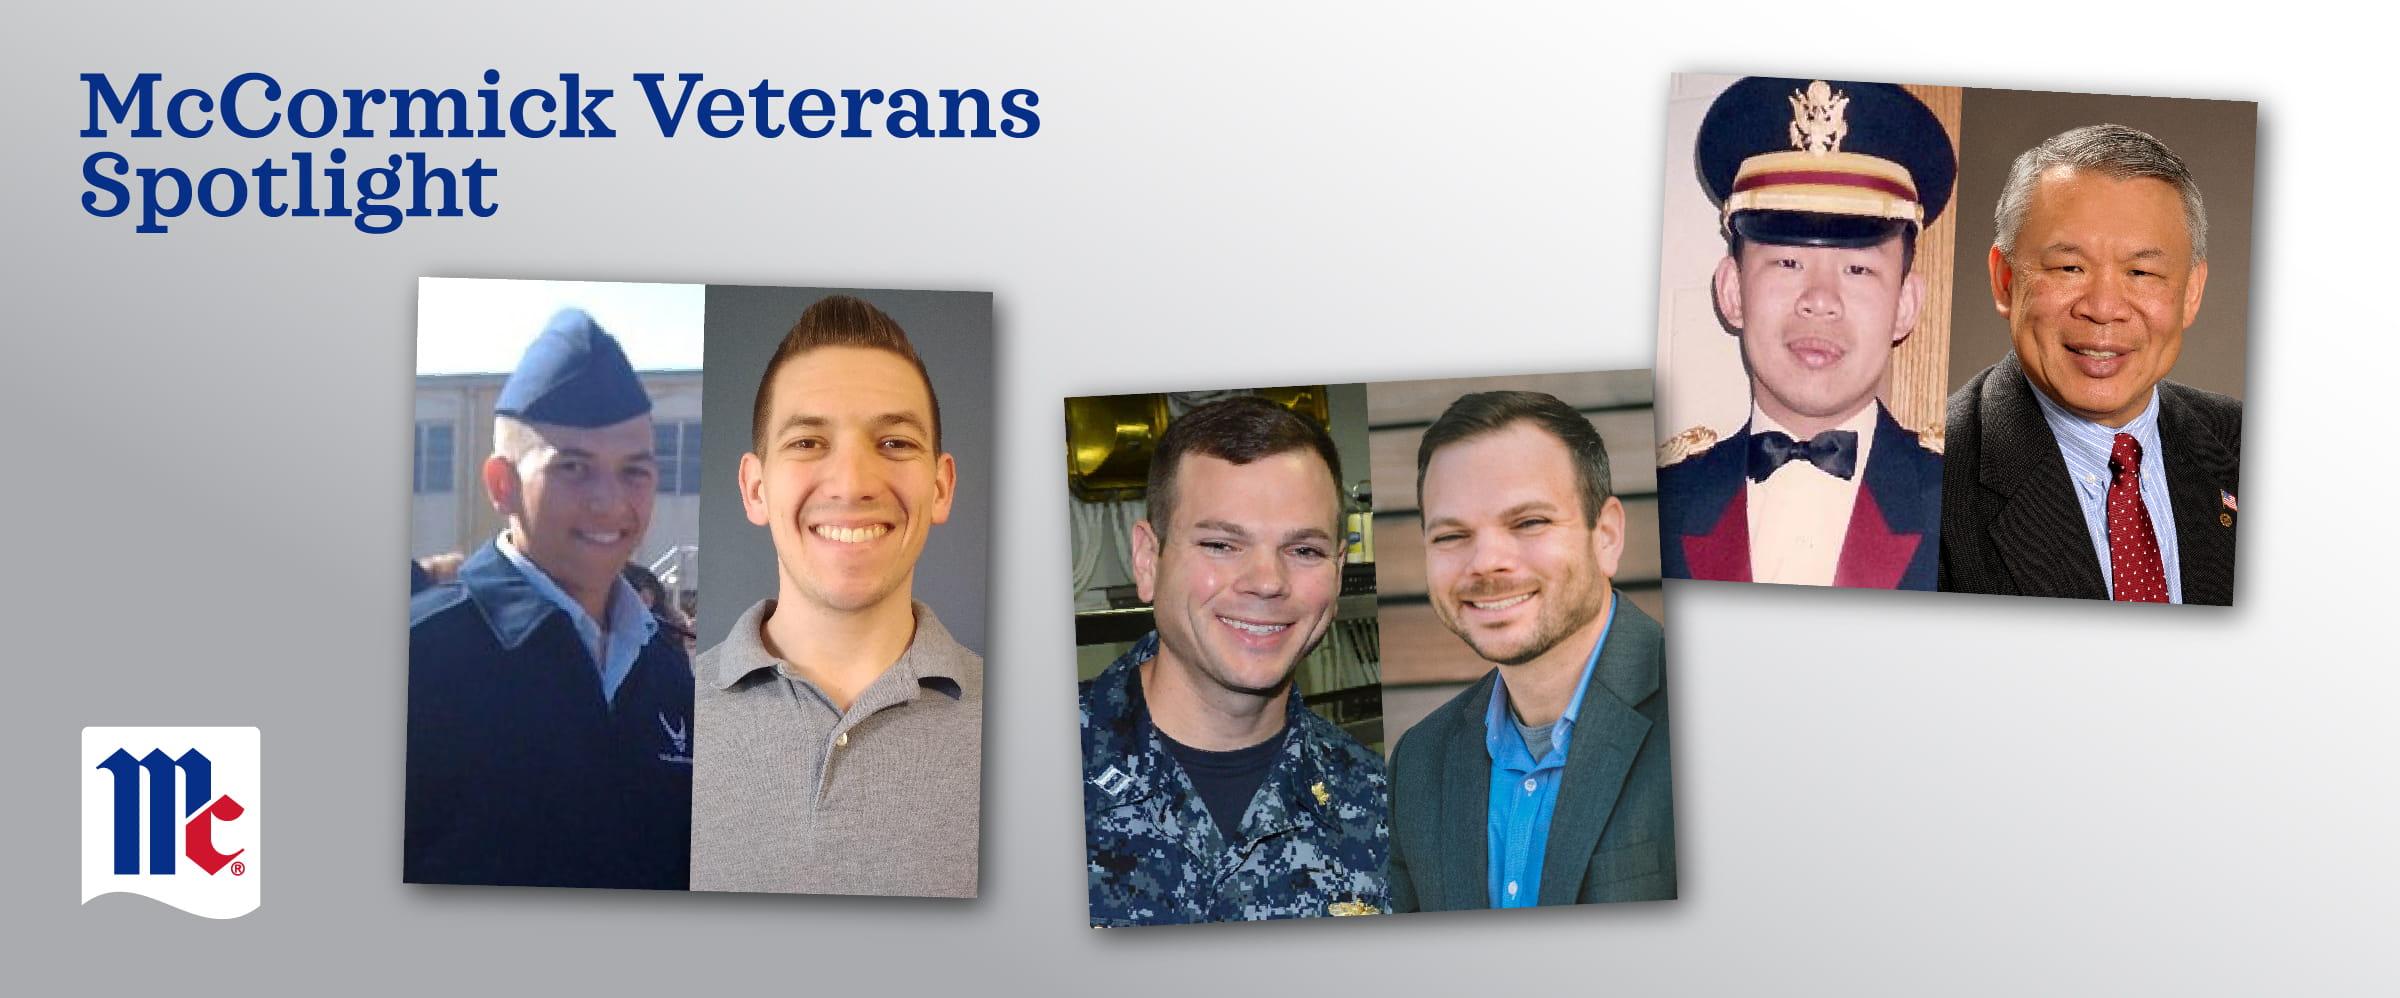 McCormick & Company Veterans; employee engagement group; hiring veterans